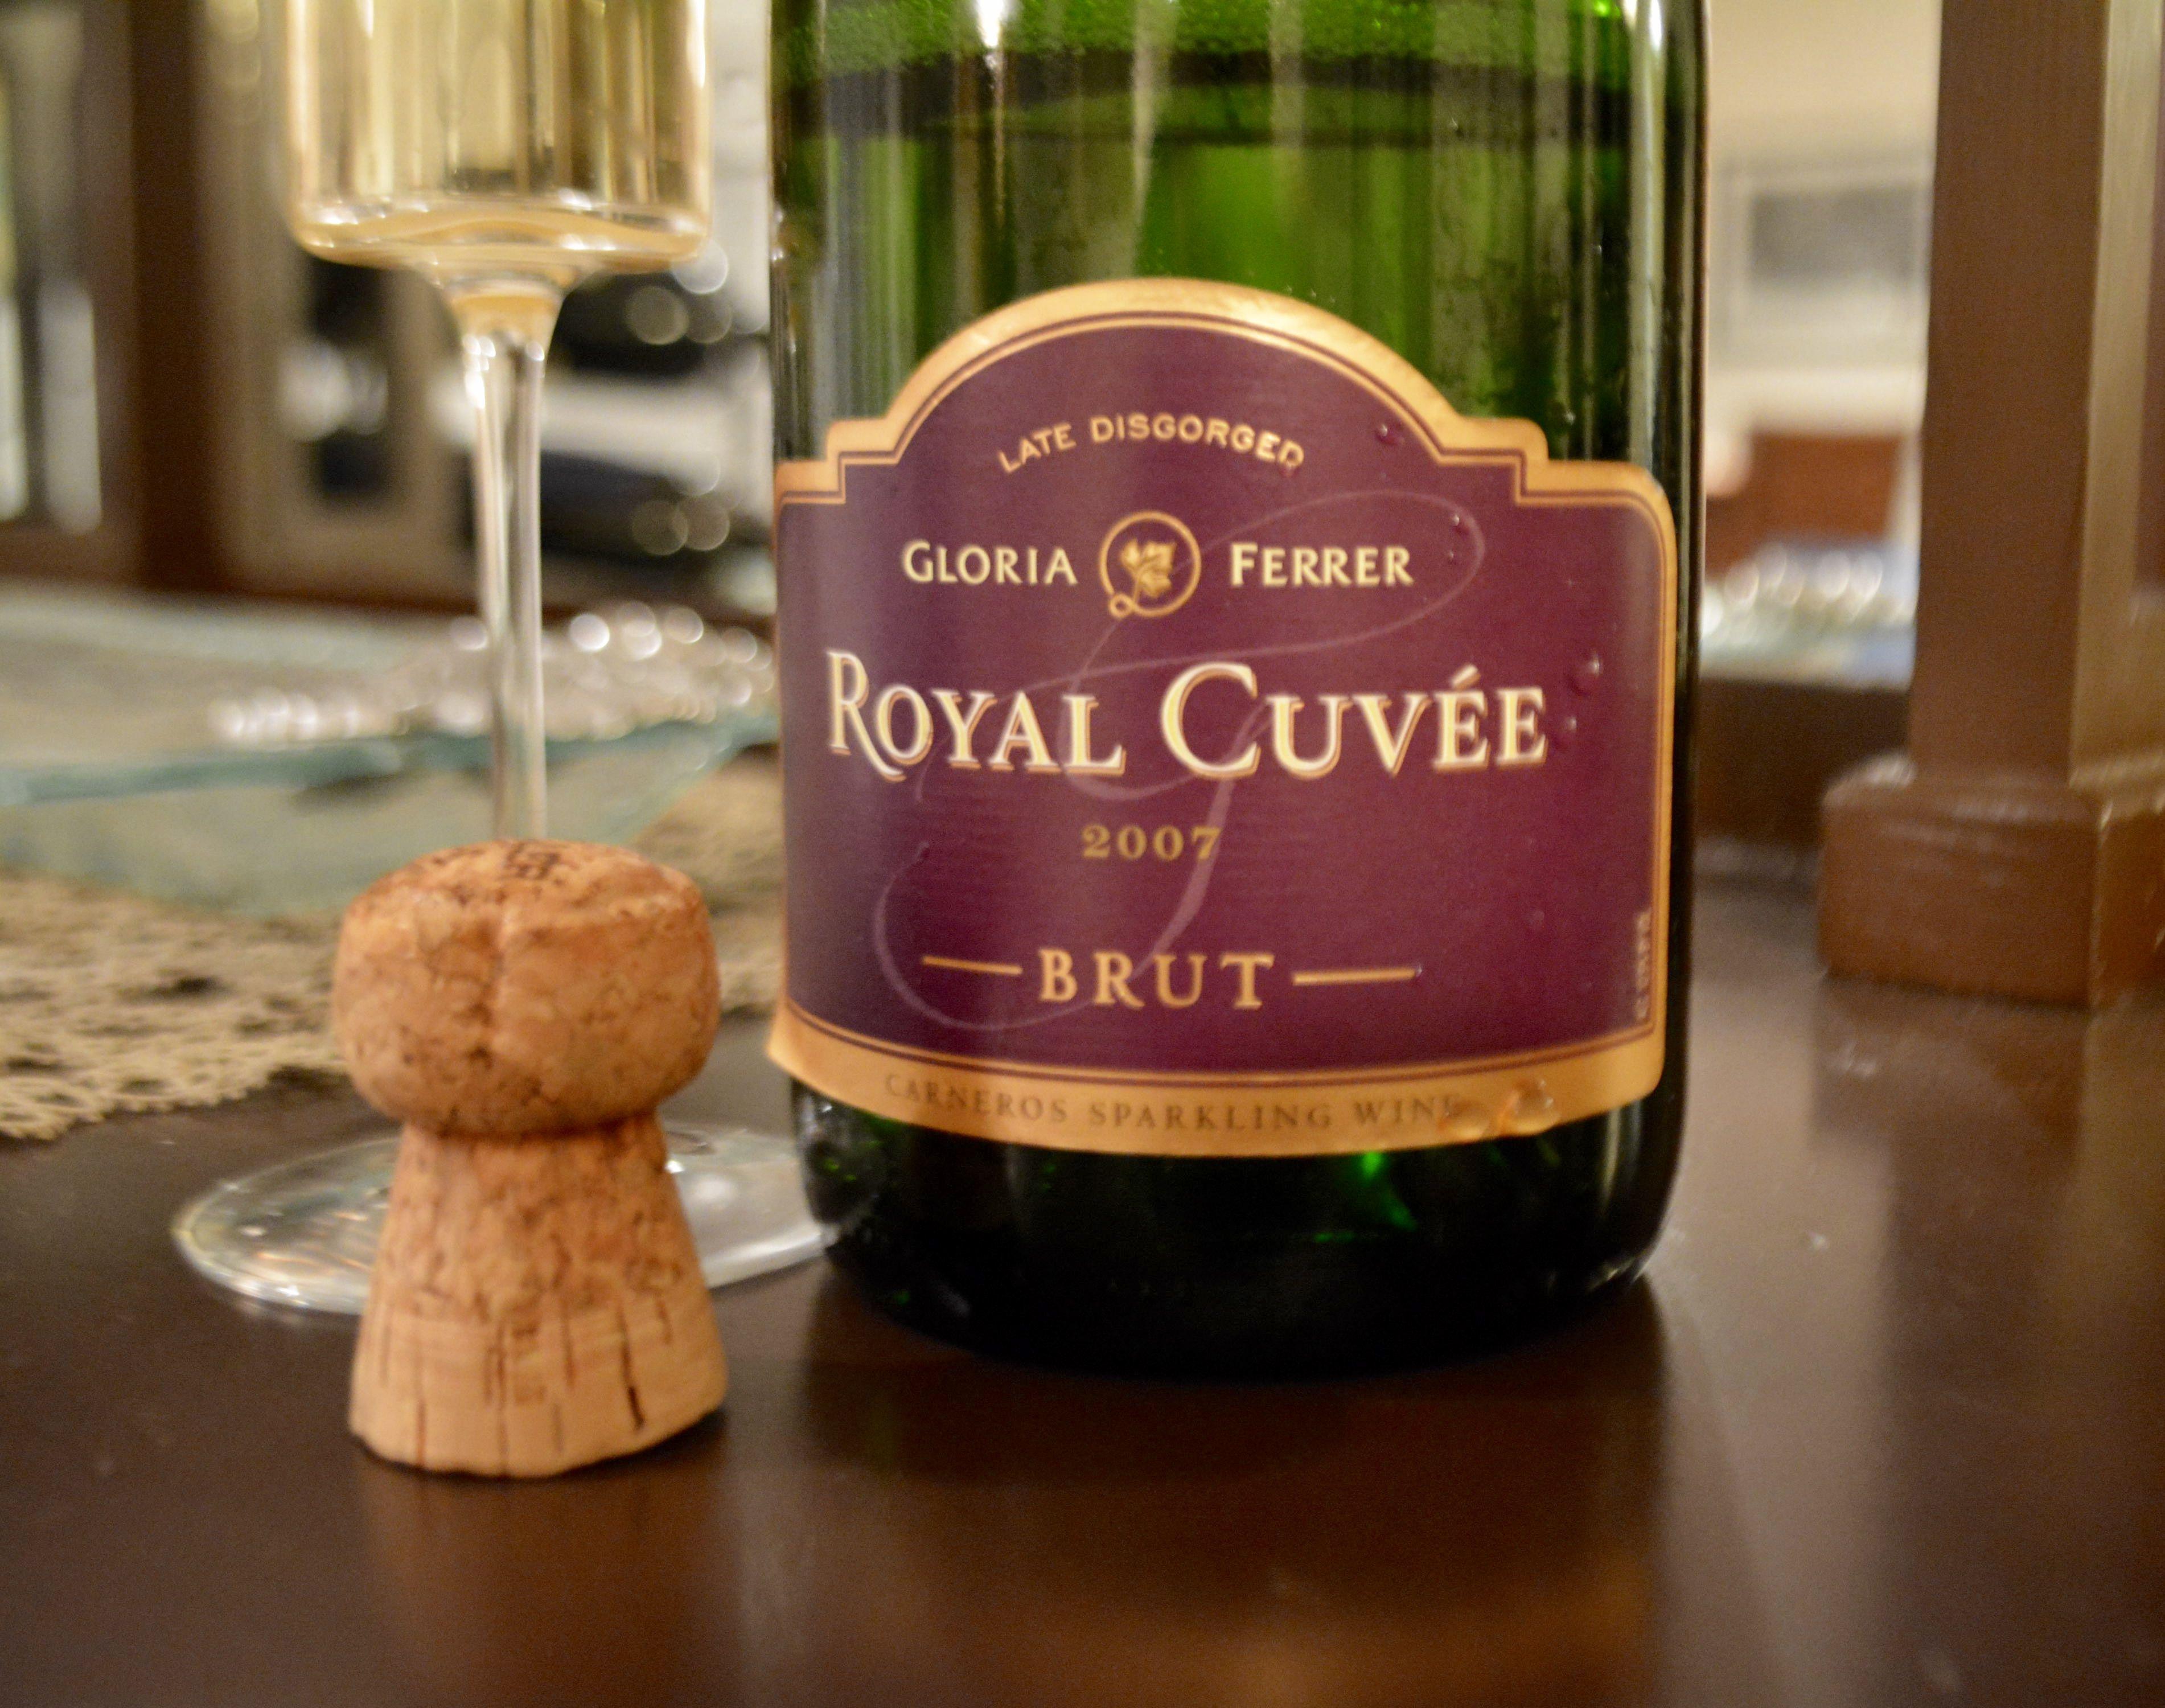 Wine Wednesday Gloria Ferrer Royal Cuvee Brut 2007 Pinot Noir Grapes Wine Bottle Wine Wednesday